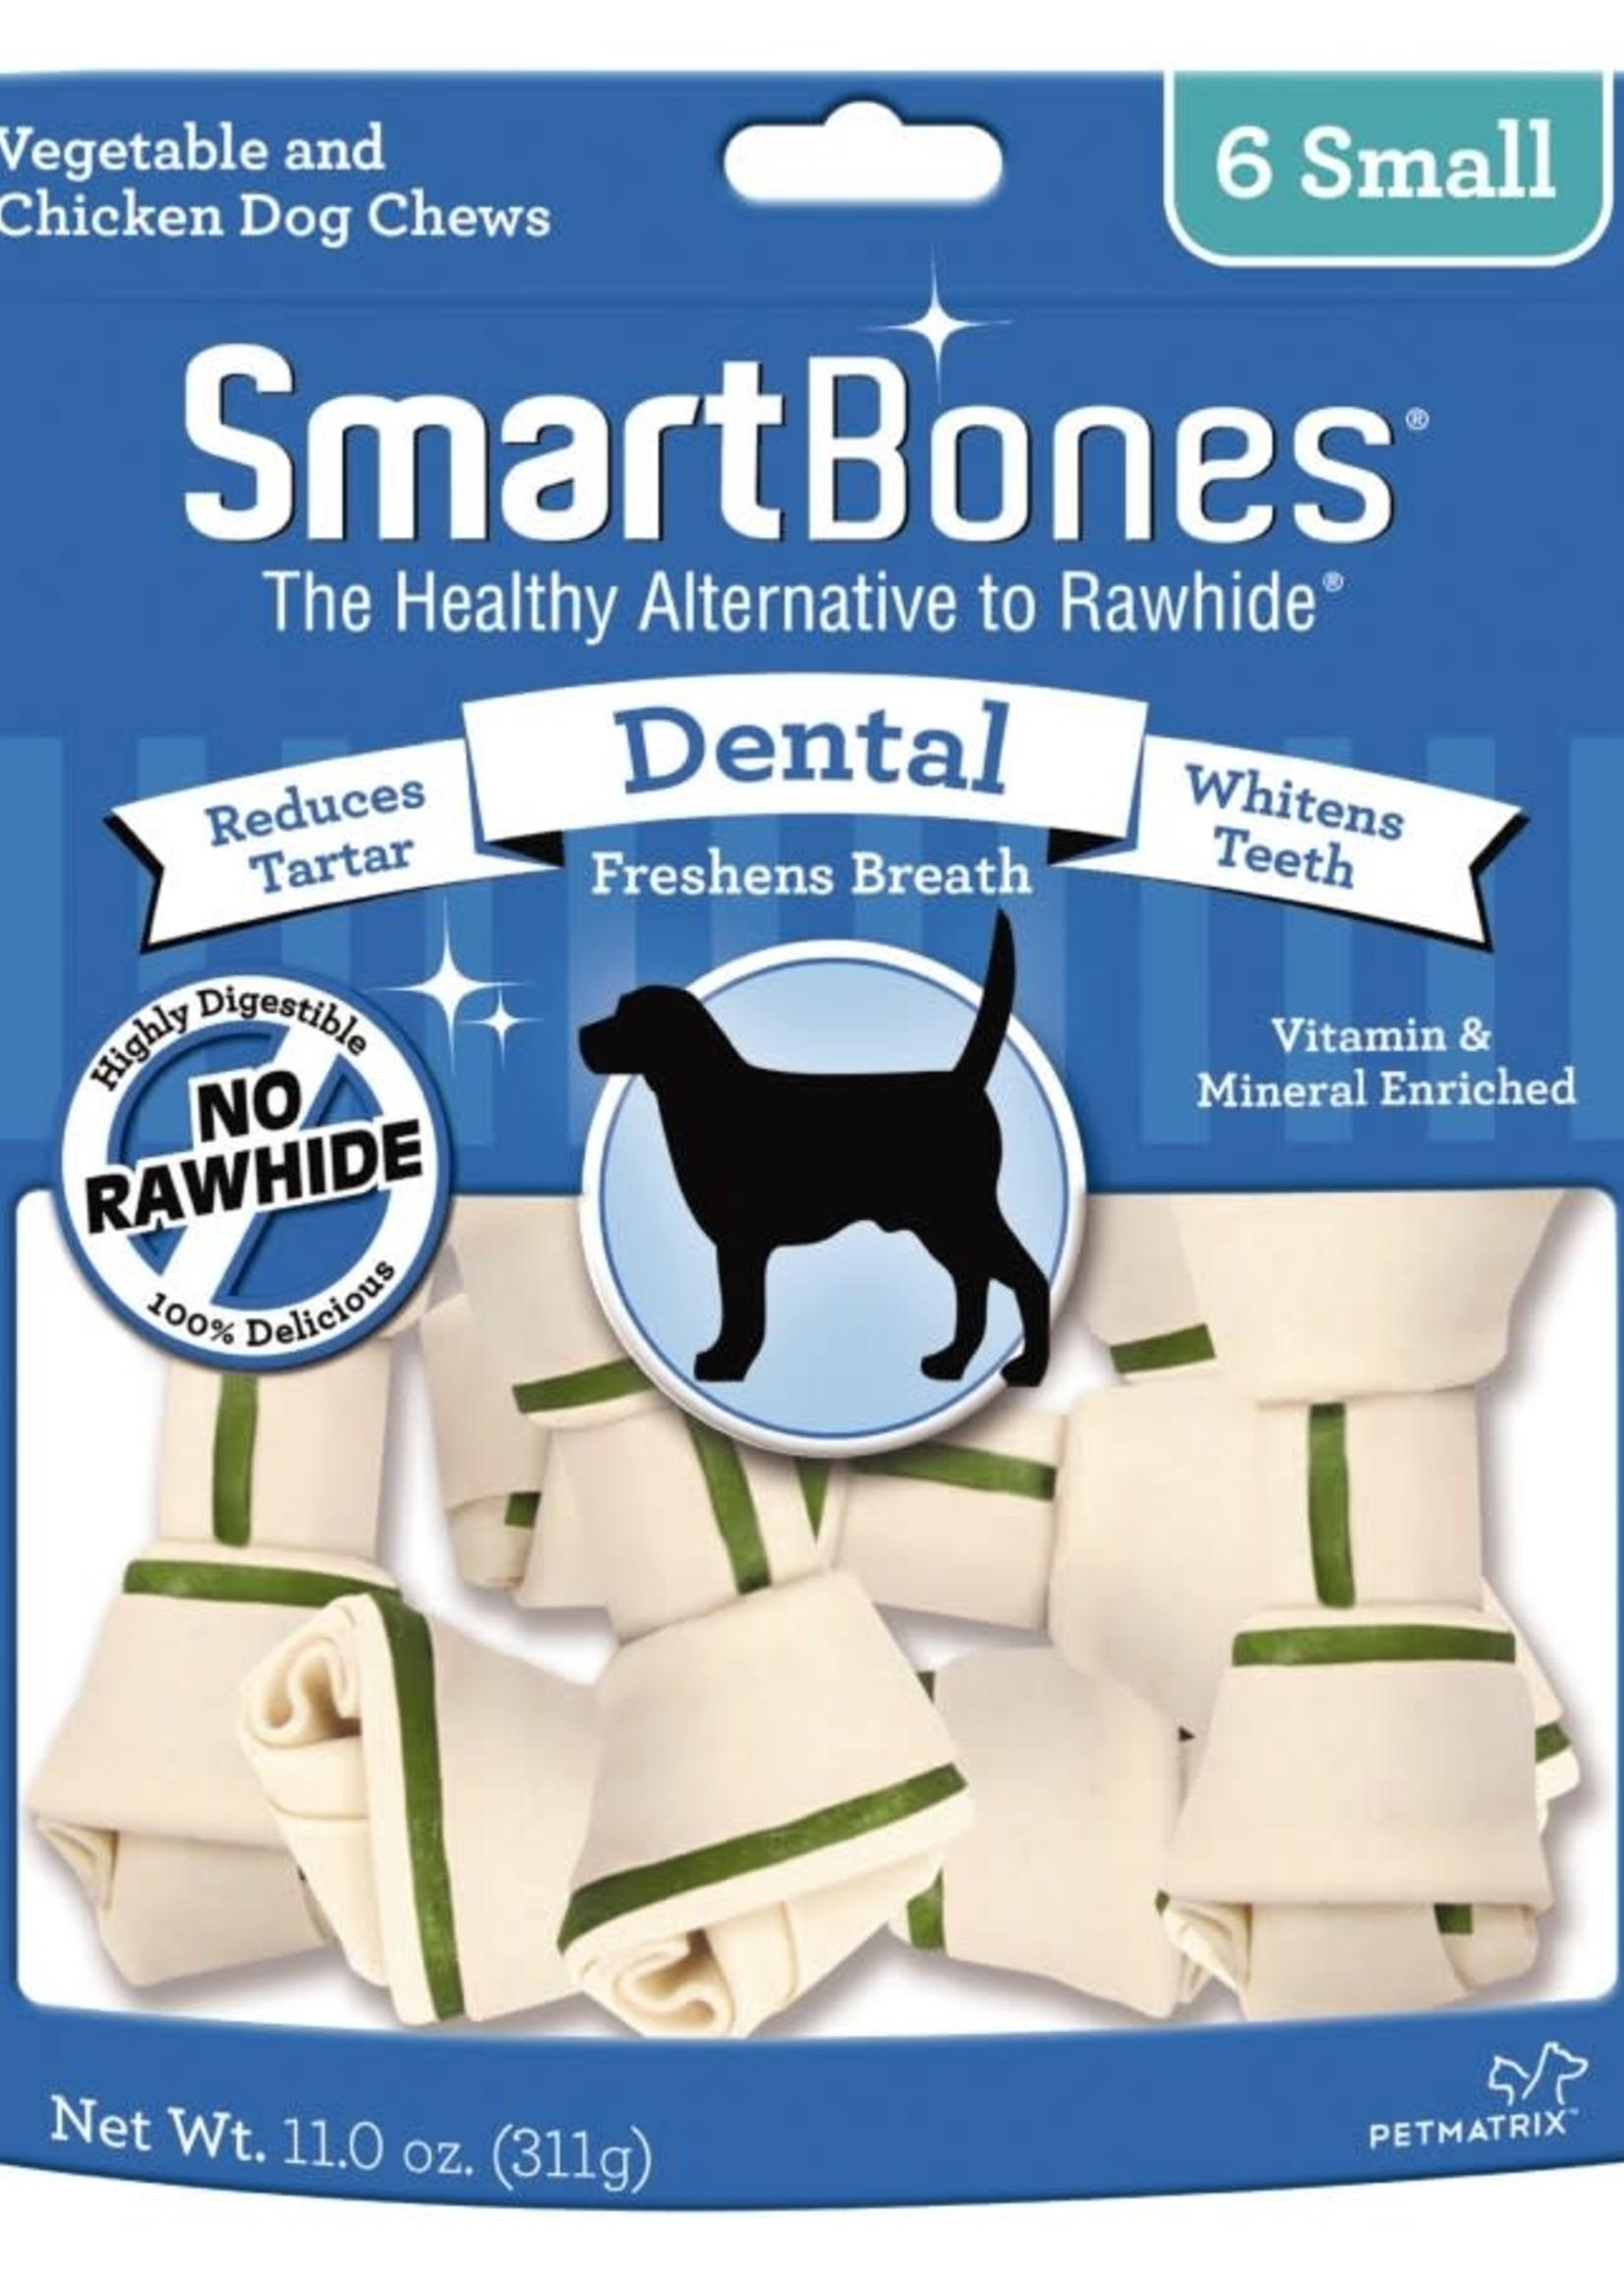 Smart Bones Dental Small Chews 6PK